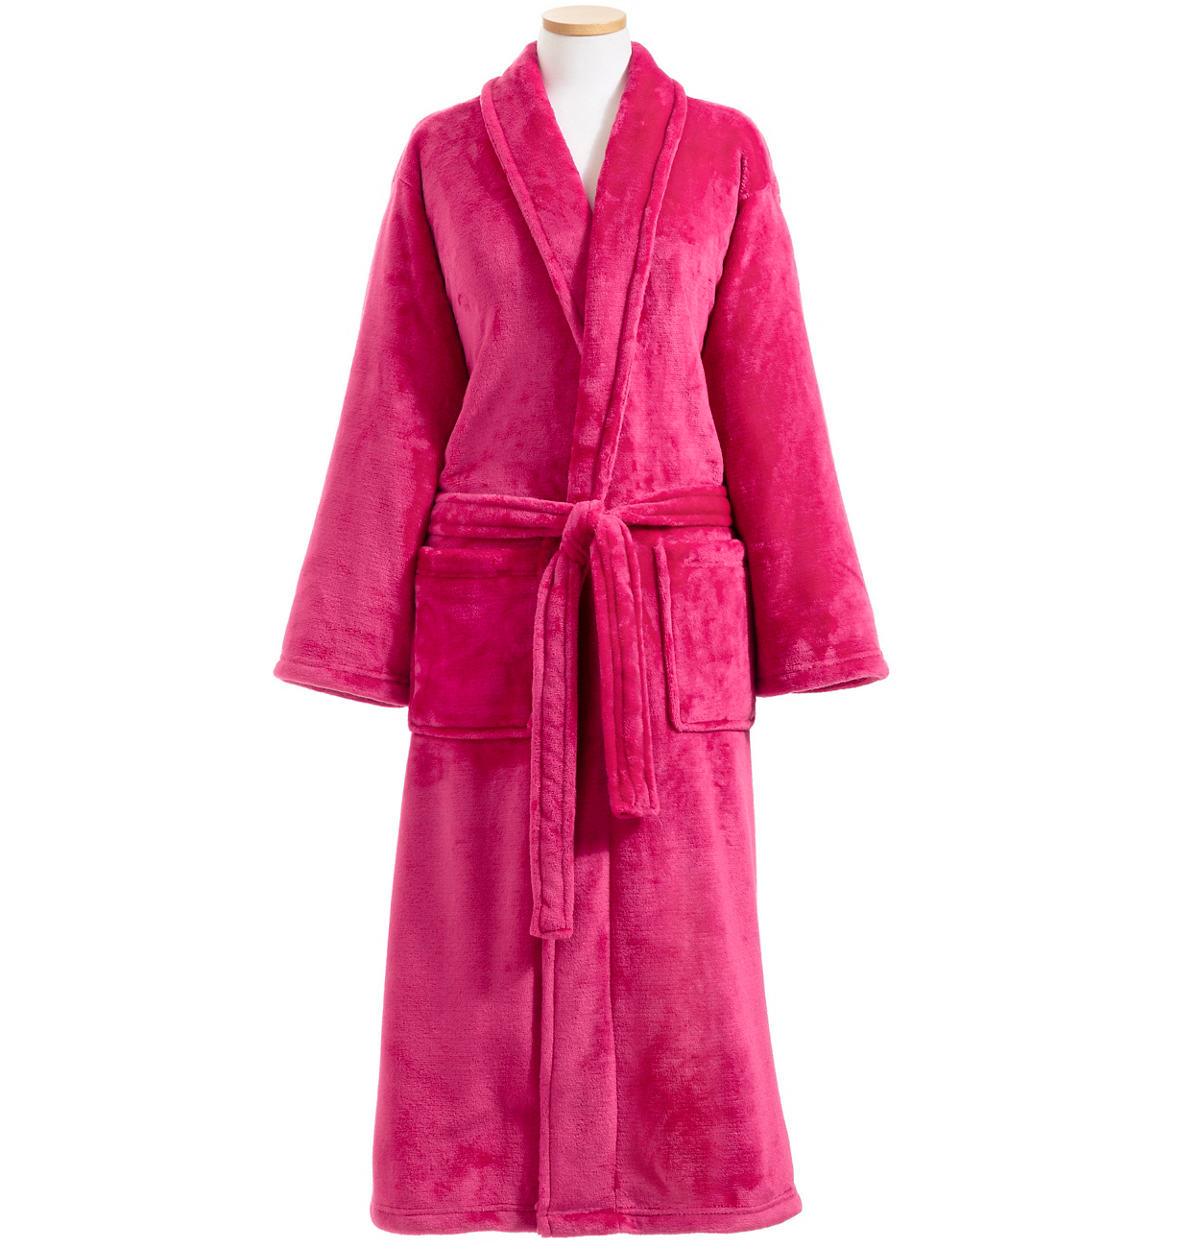 Sheepy Fleece 2.0 Cerise Robe